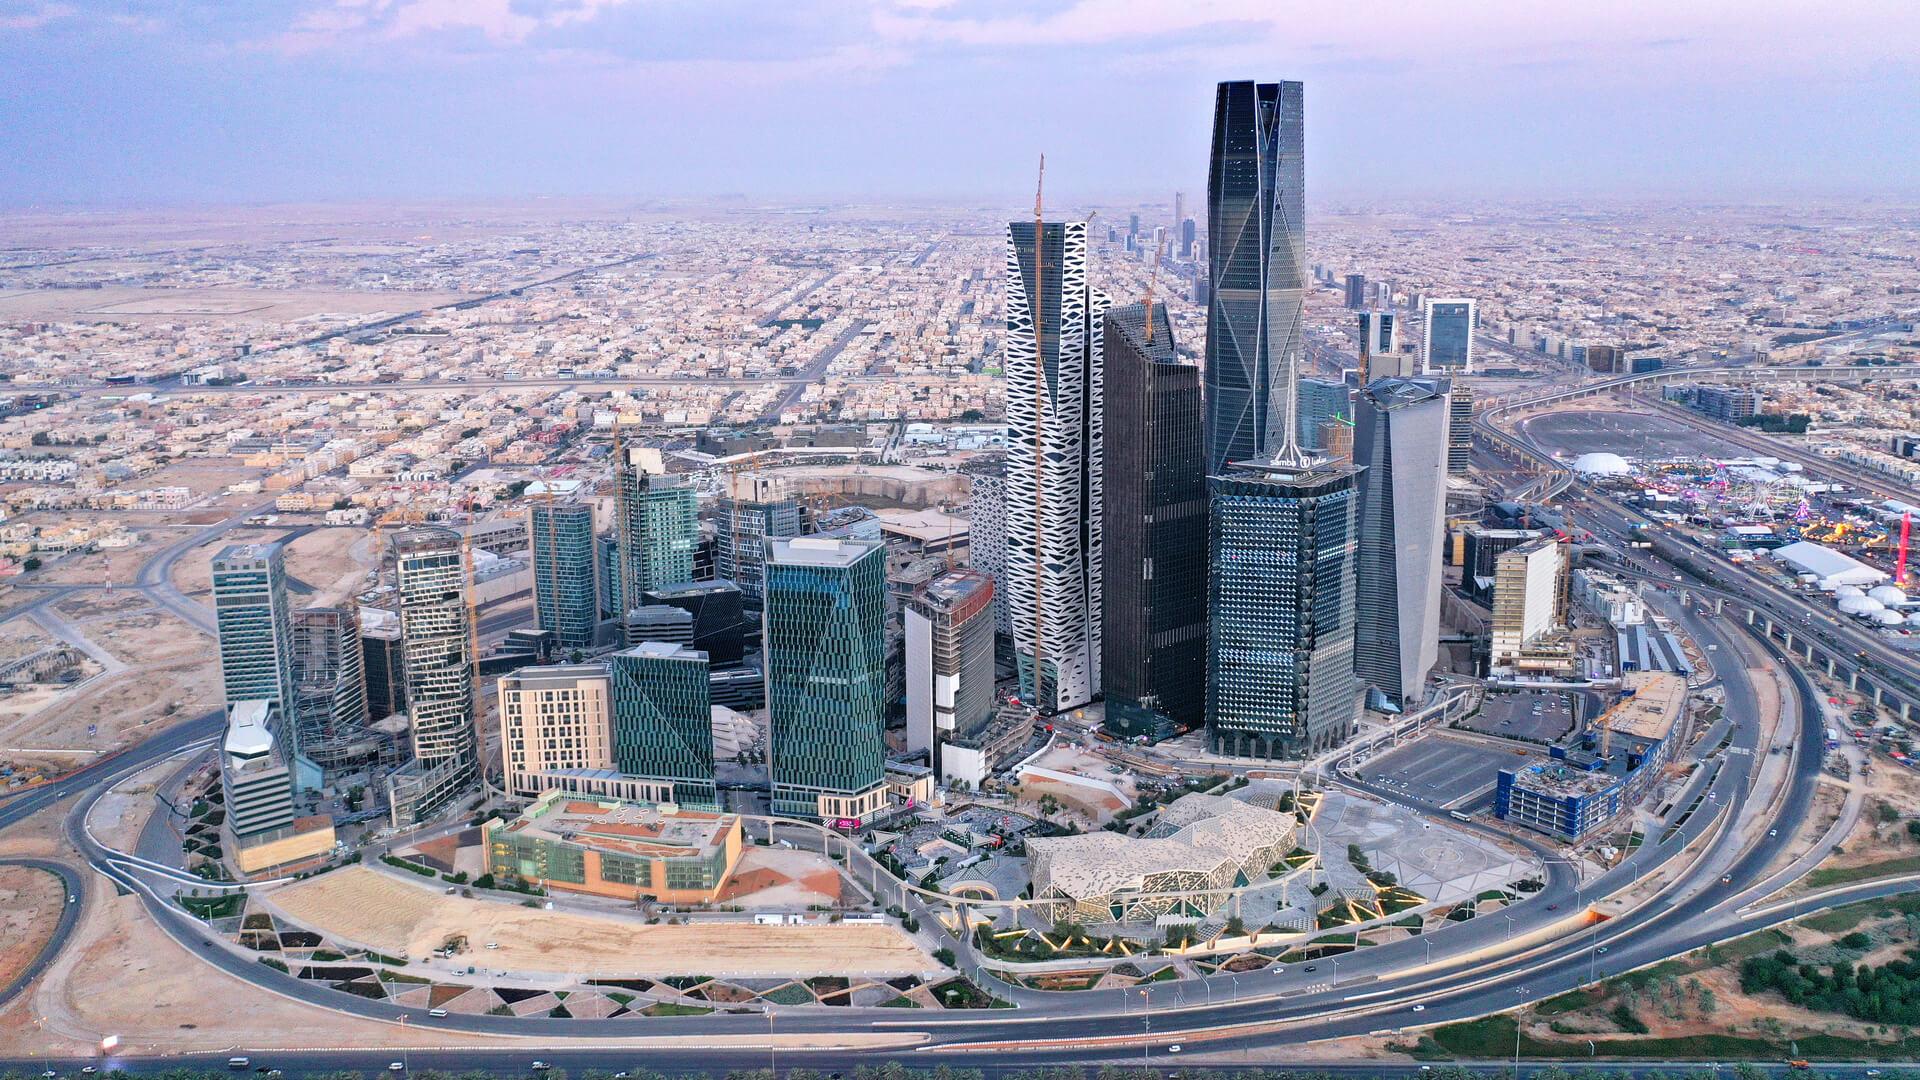 Saudi Arabia architecture